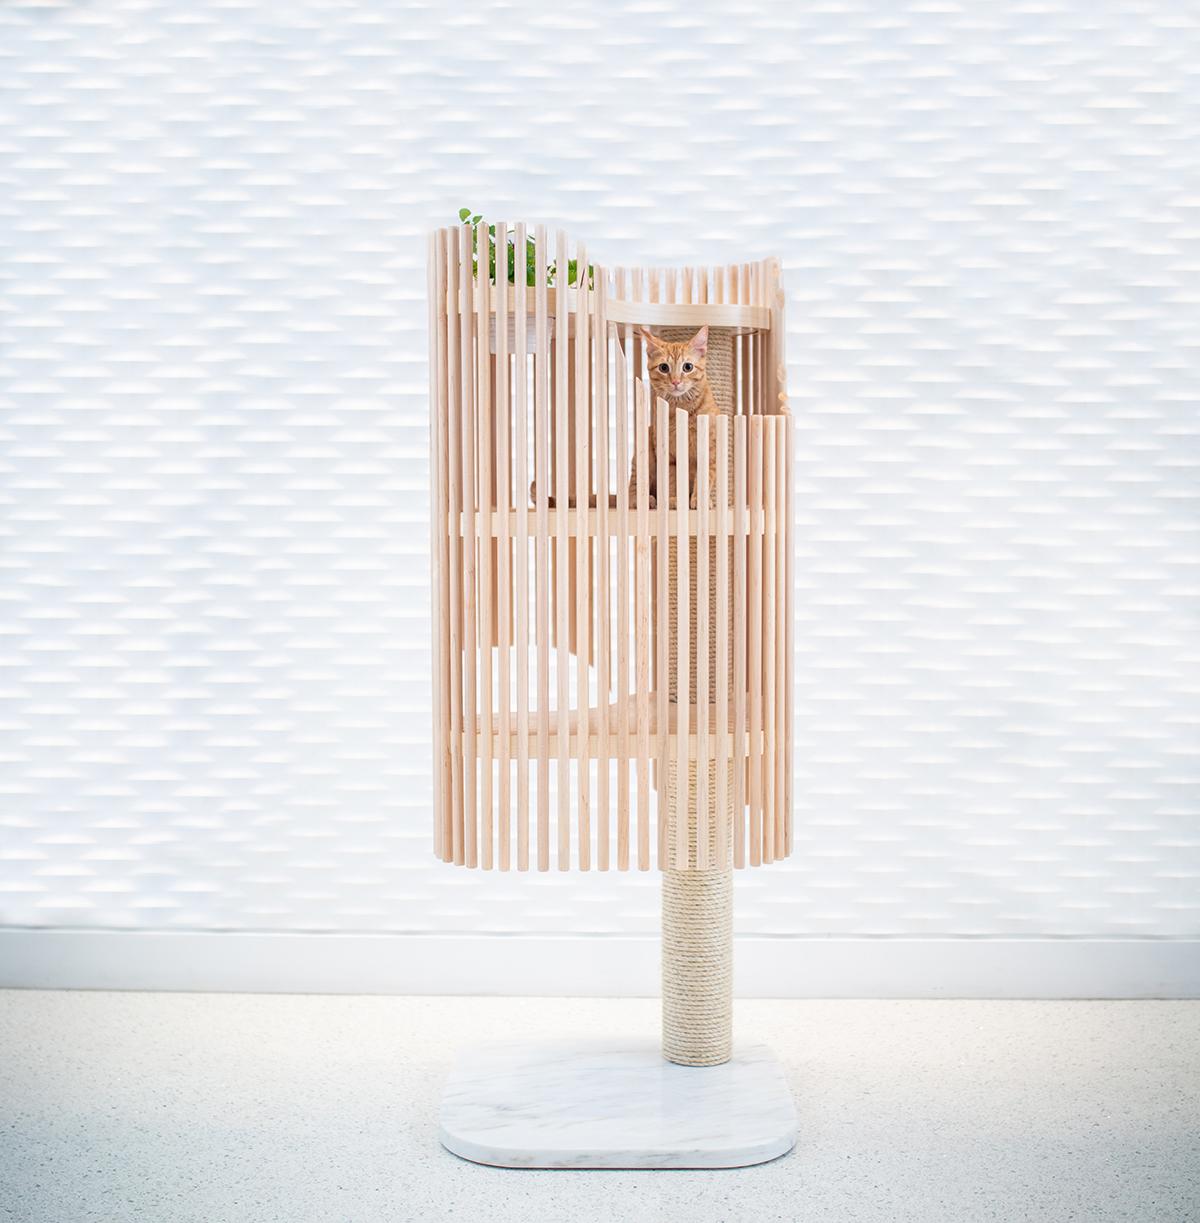 Cat Tower - Malone Maxwell Borson Architects